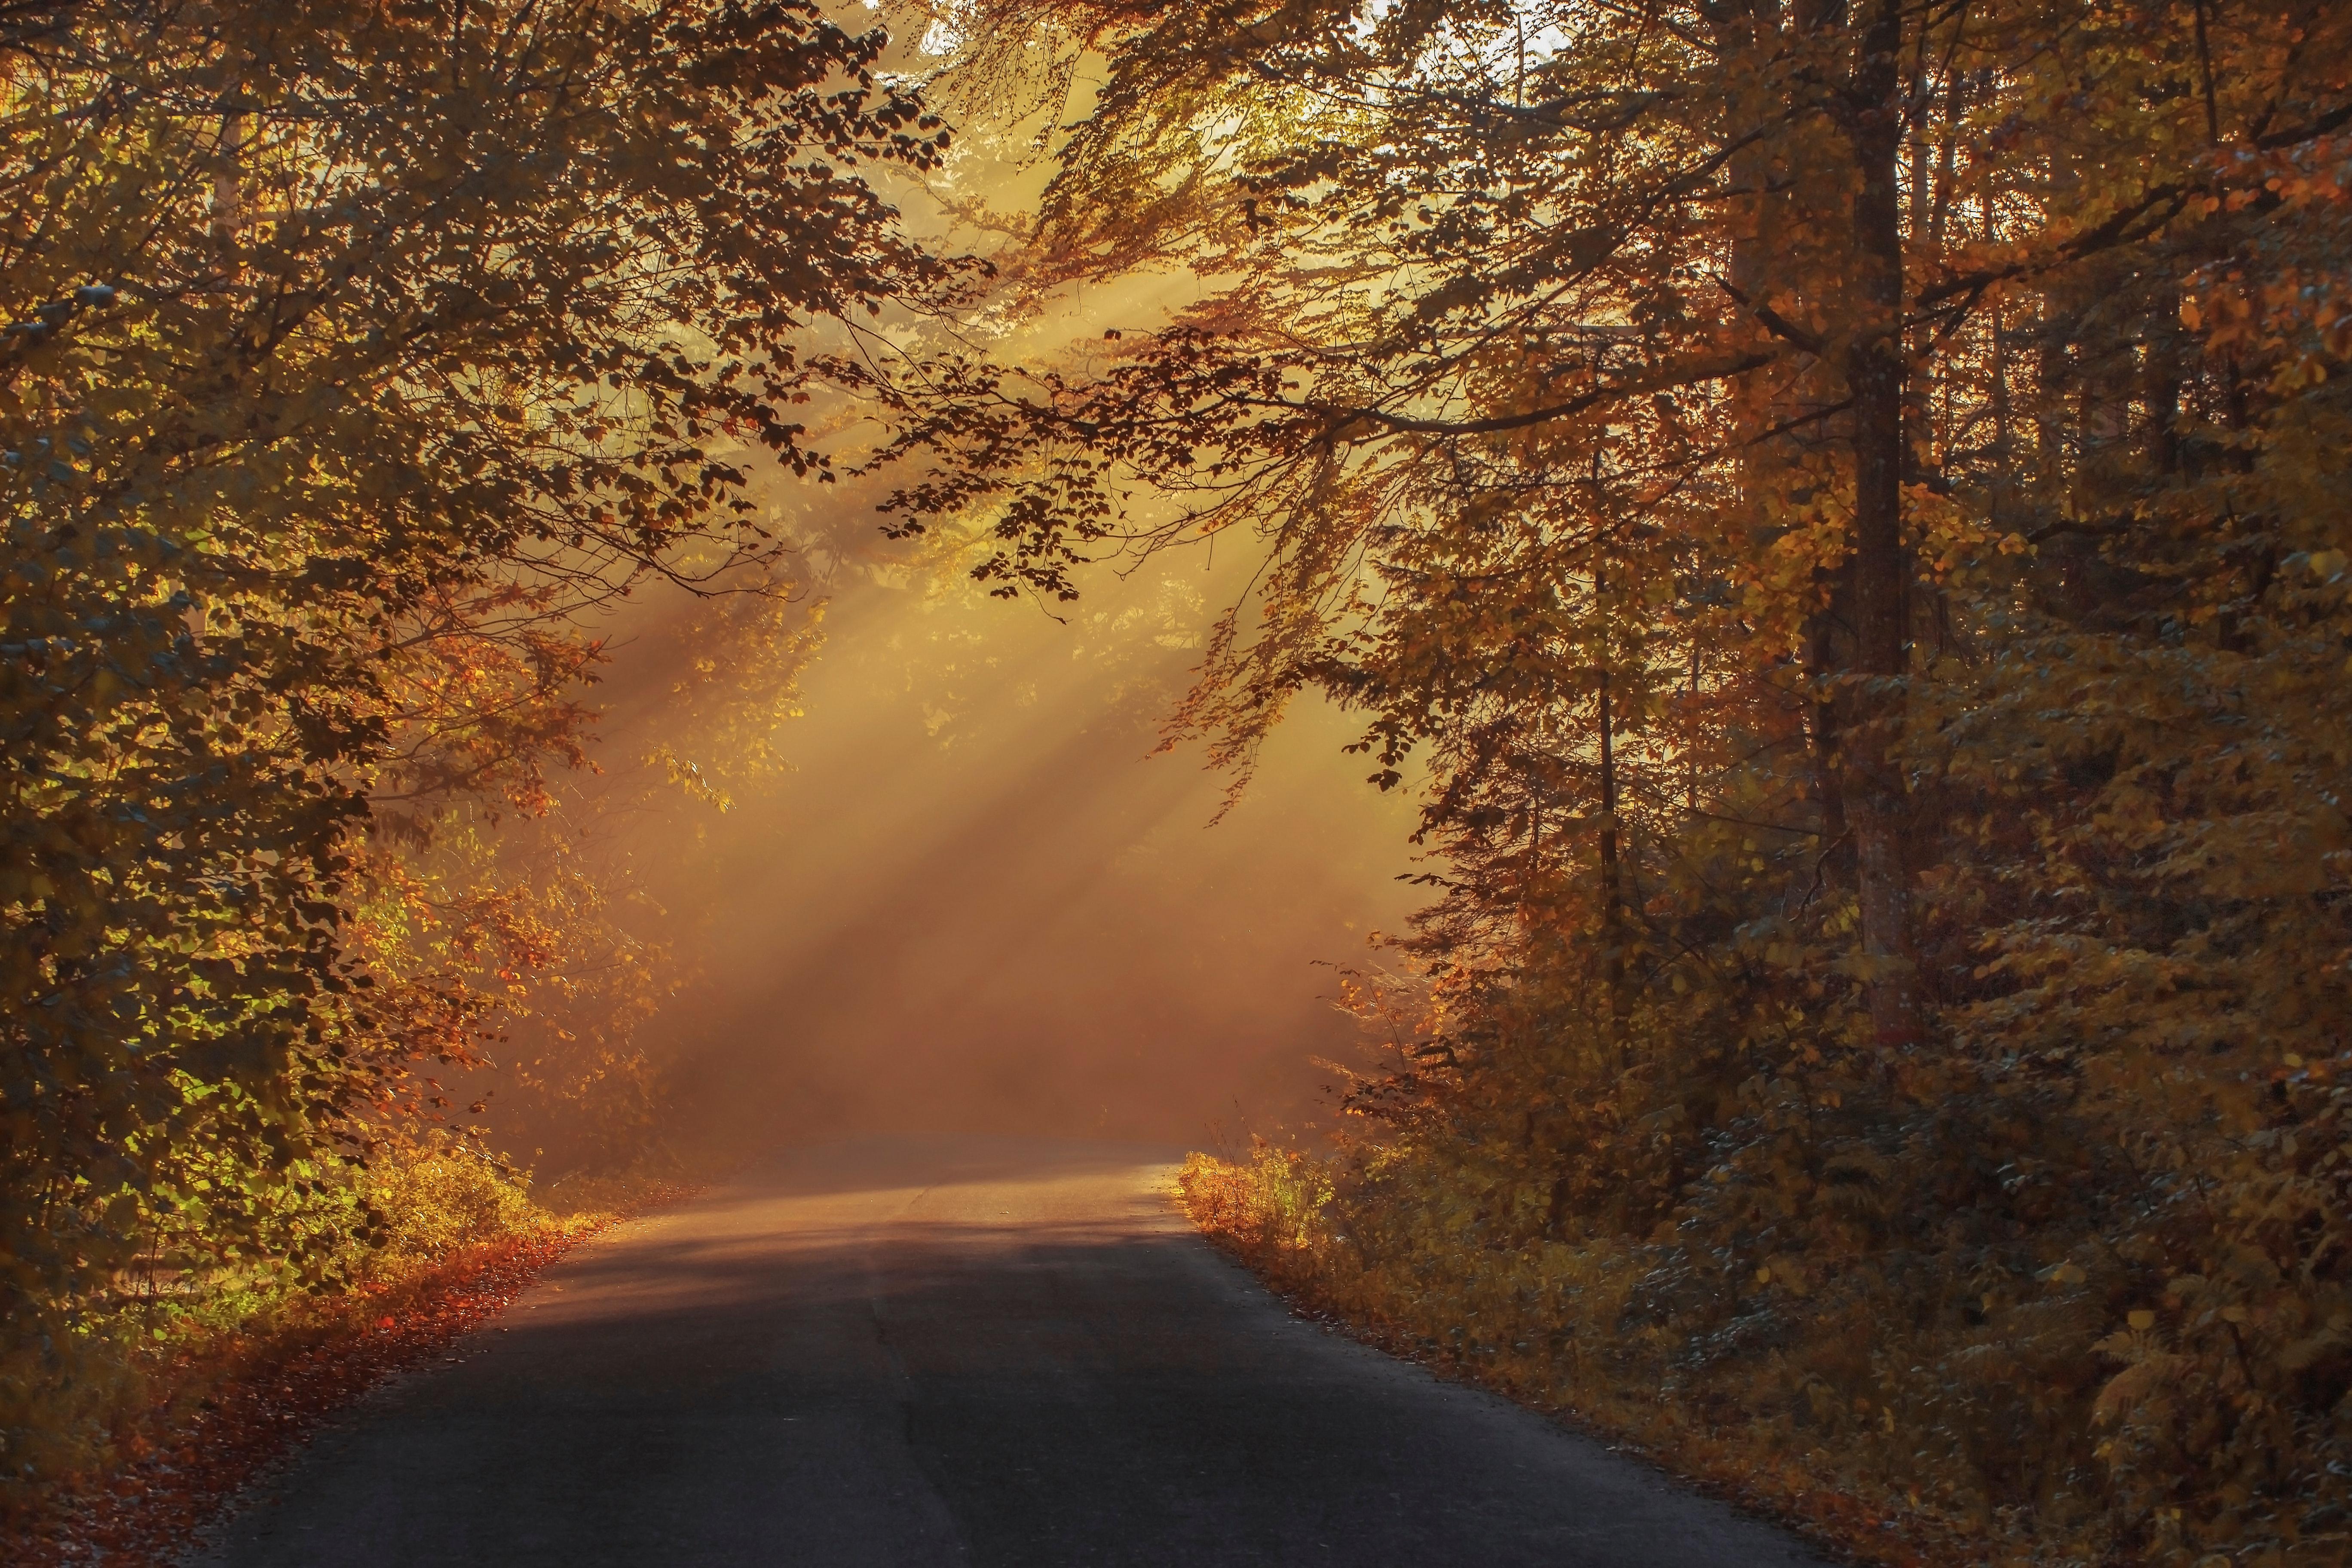 Gray Asphalt Road in Between Brown Orange Leaf Trees during Daytime, Autumnal, Rays, Wood, Water, HQ Photo